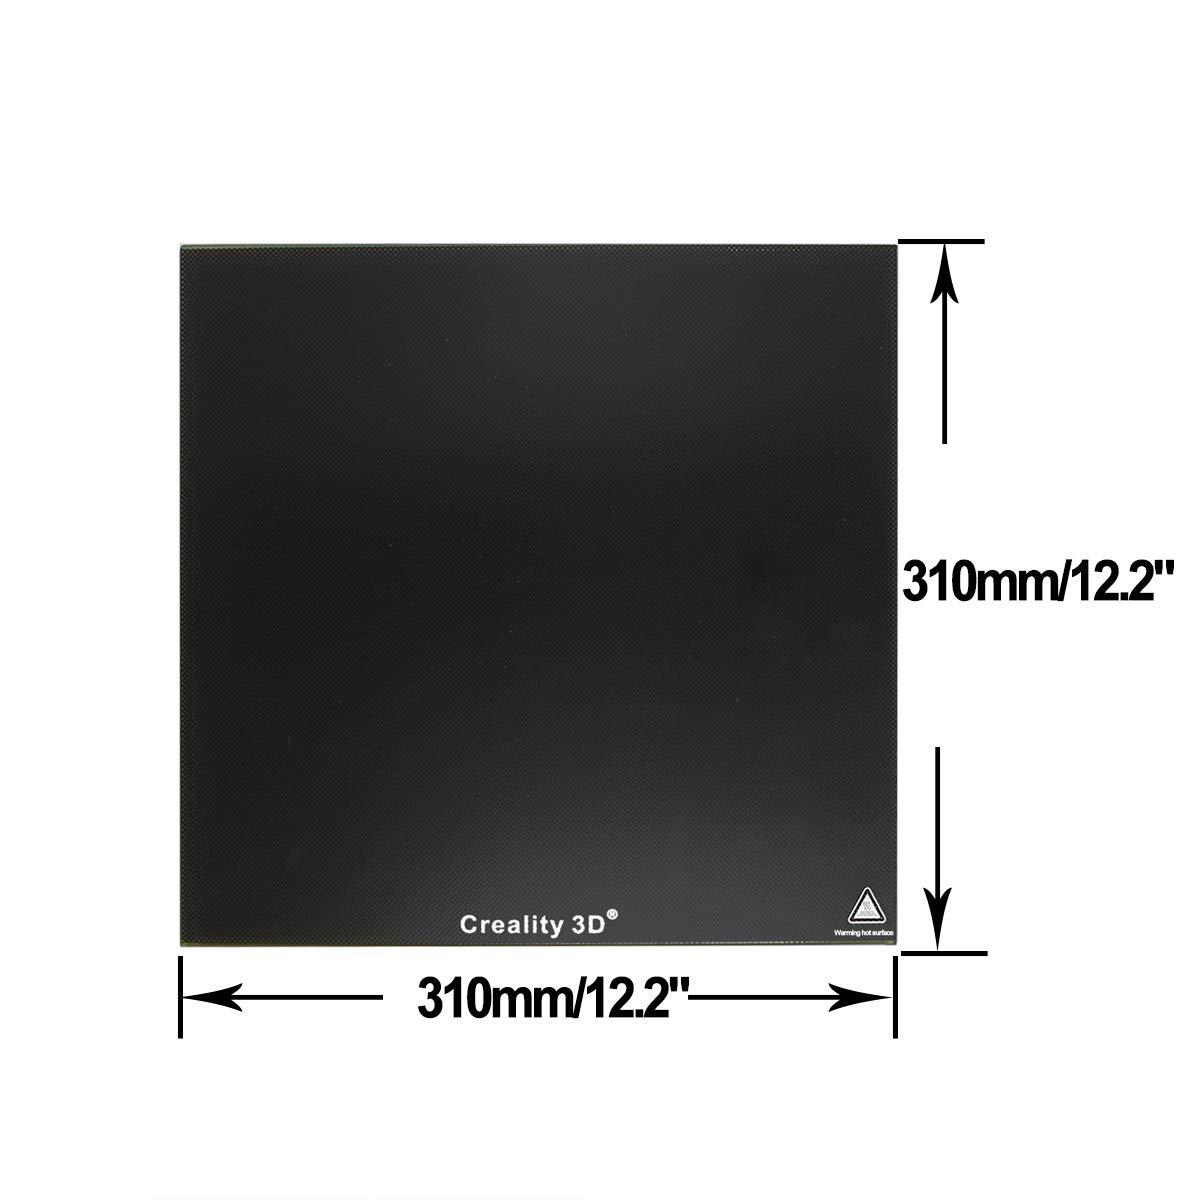 Wisamic 3d Drucker Glasplatte Oberfläche Hartglas Für 3d ... 220 X 220 X 3 Mm